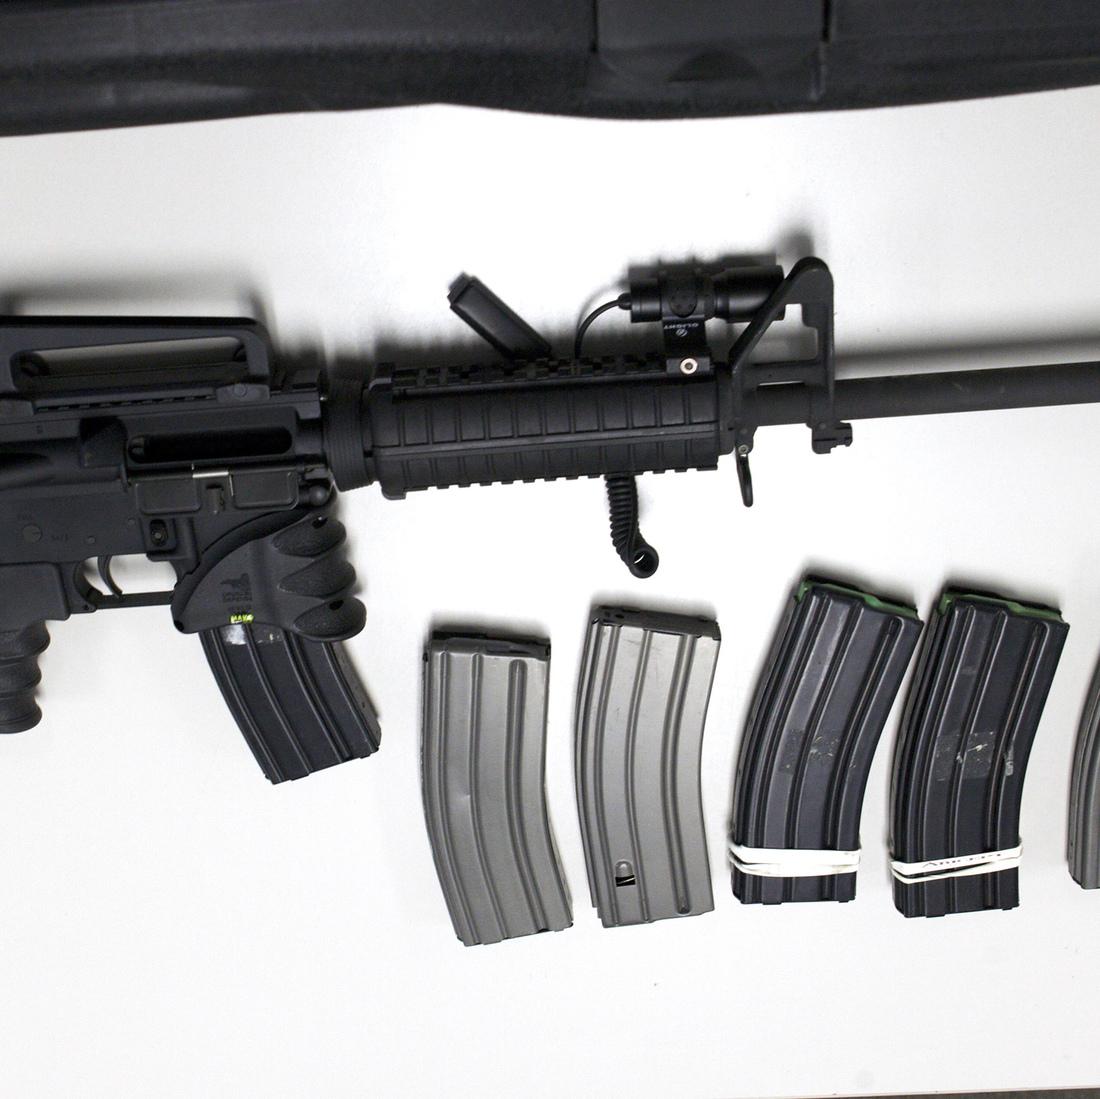 Colorado's New Gun Laws Send Businesses Packing : NPR